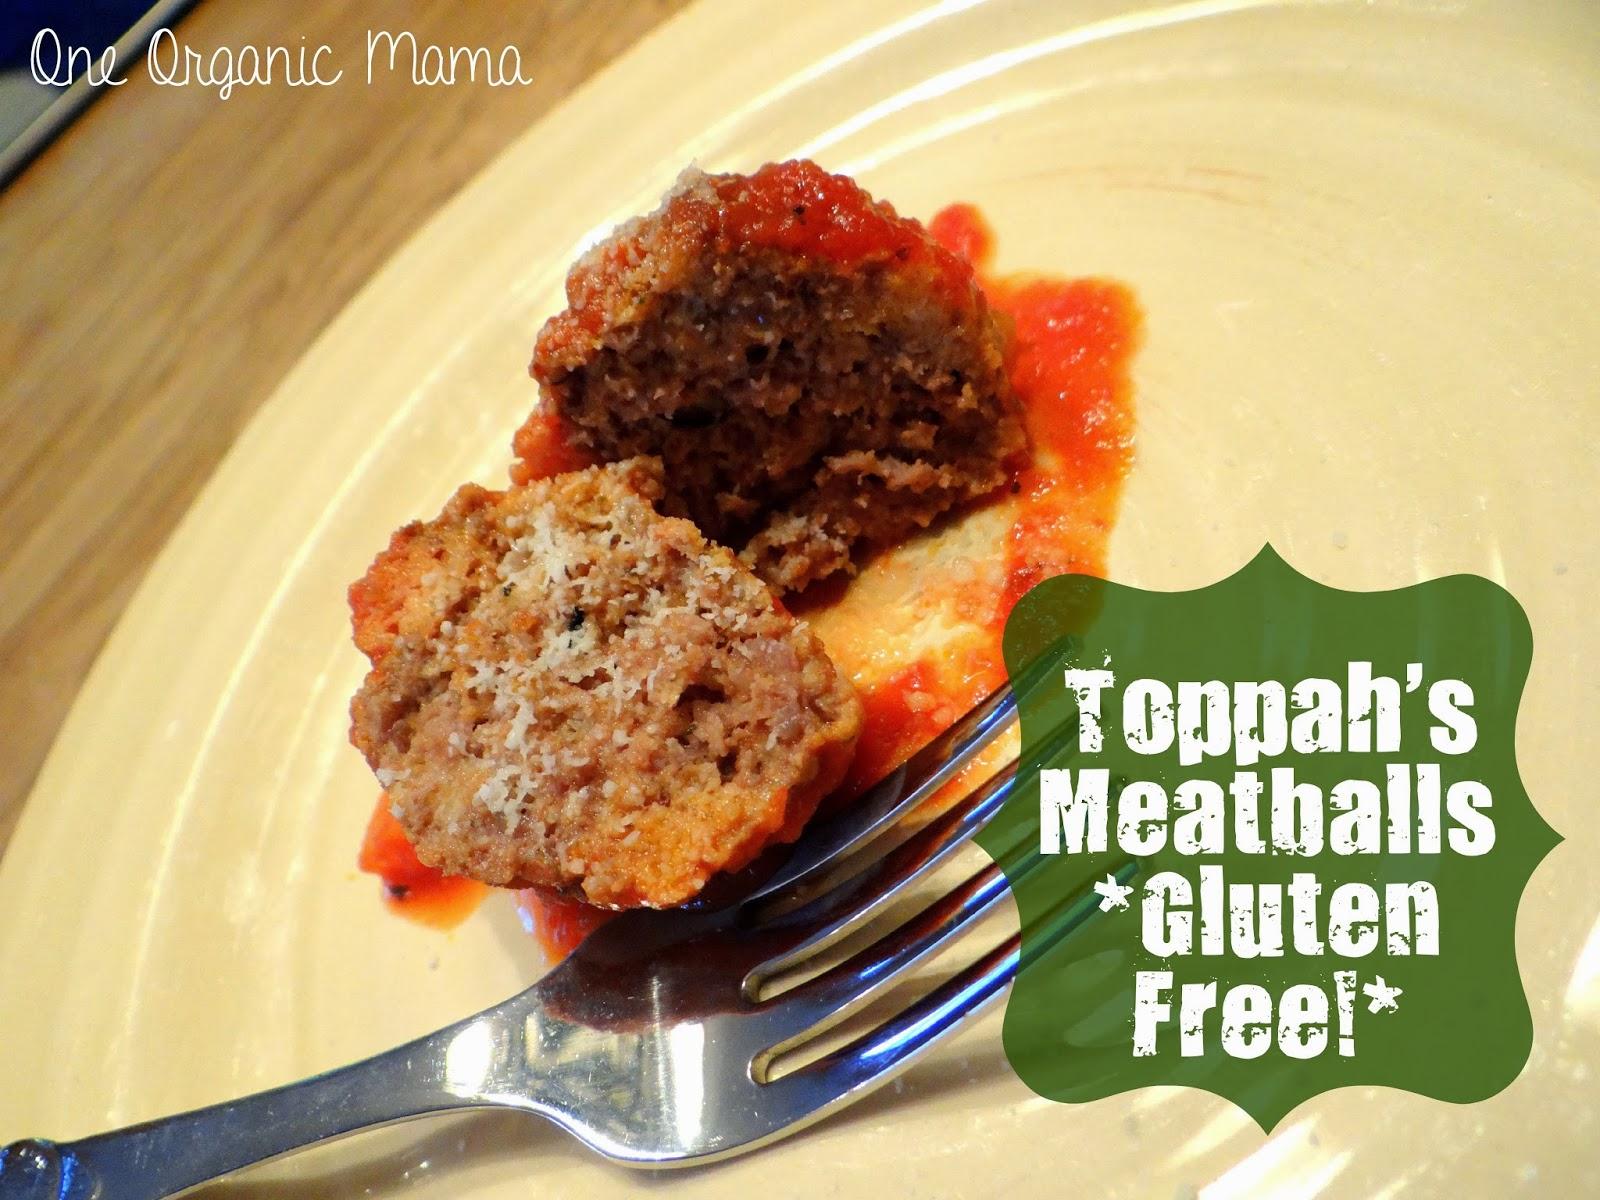 One Organic Mama Toppah S Meatballs